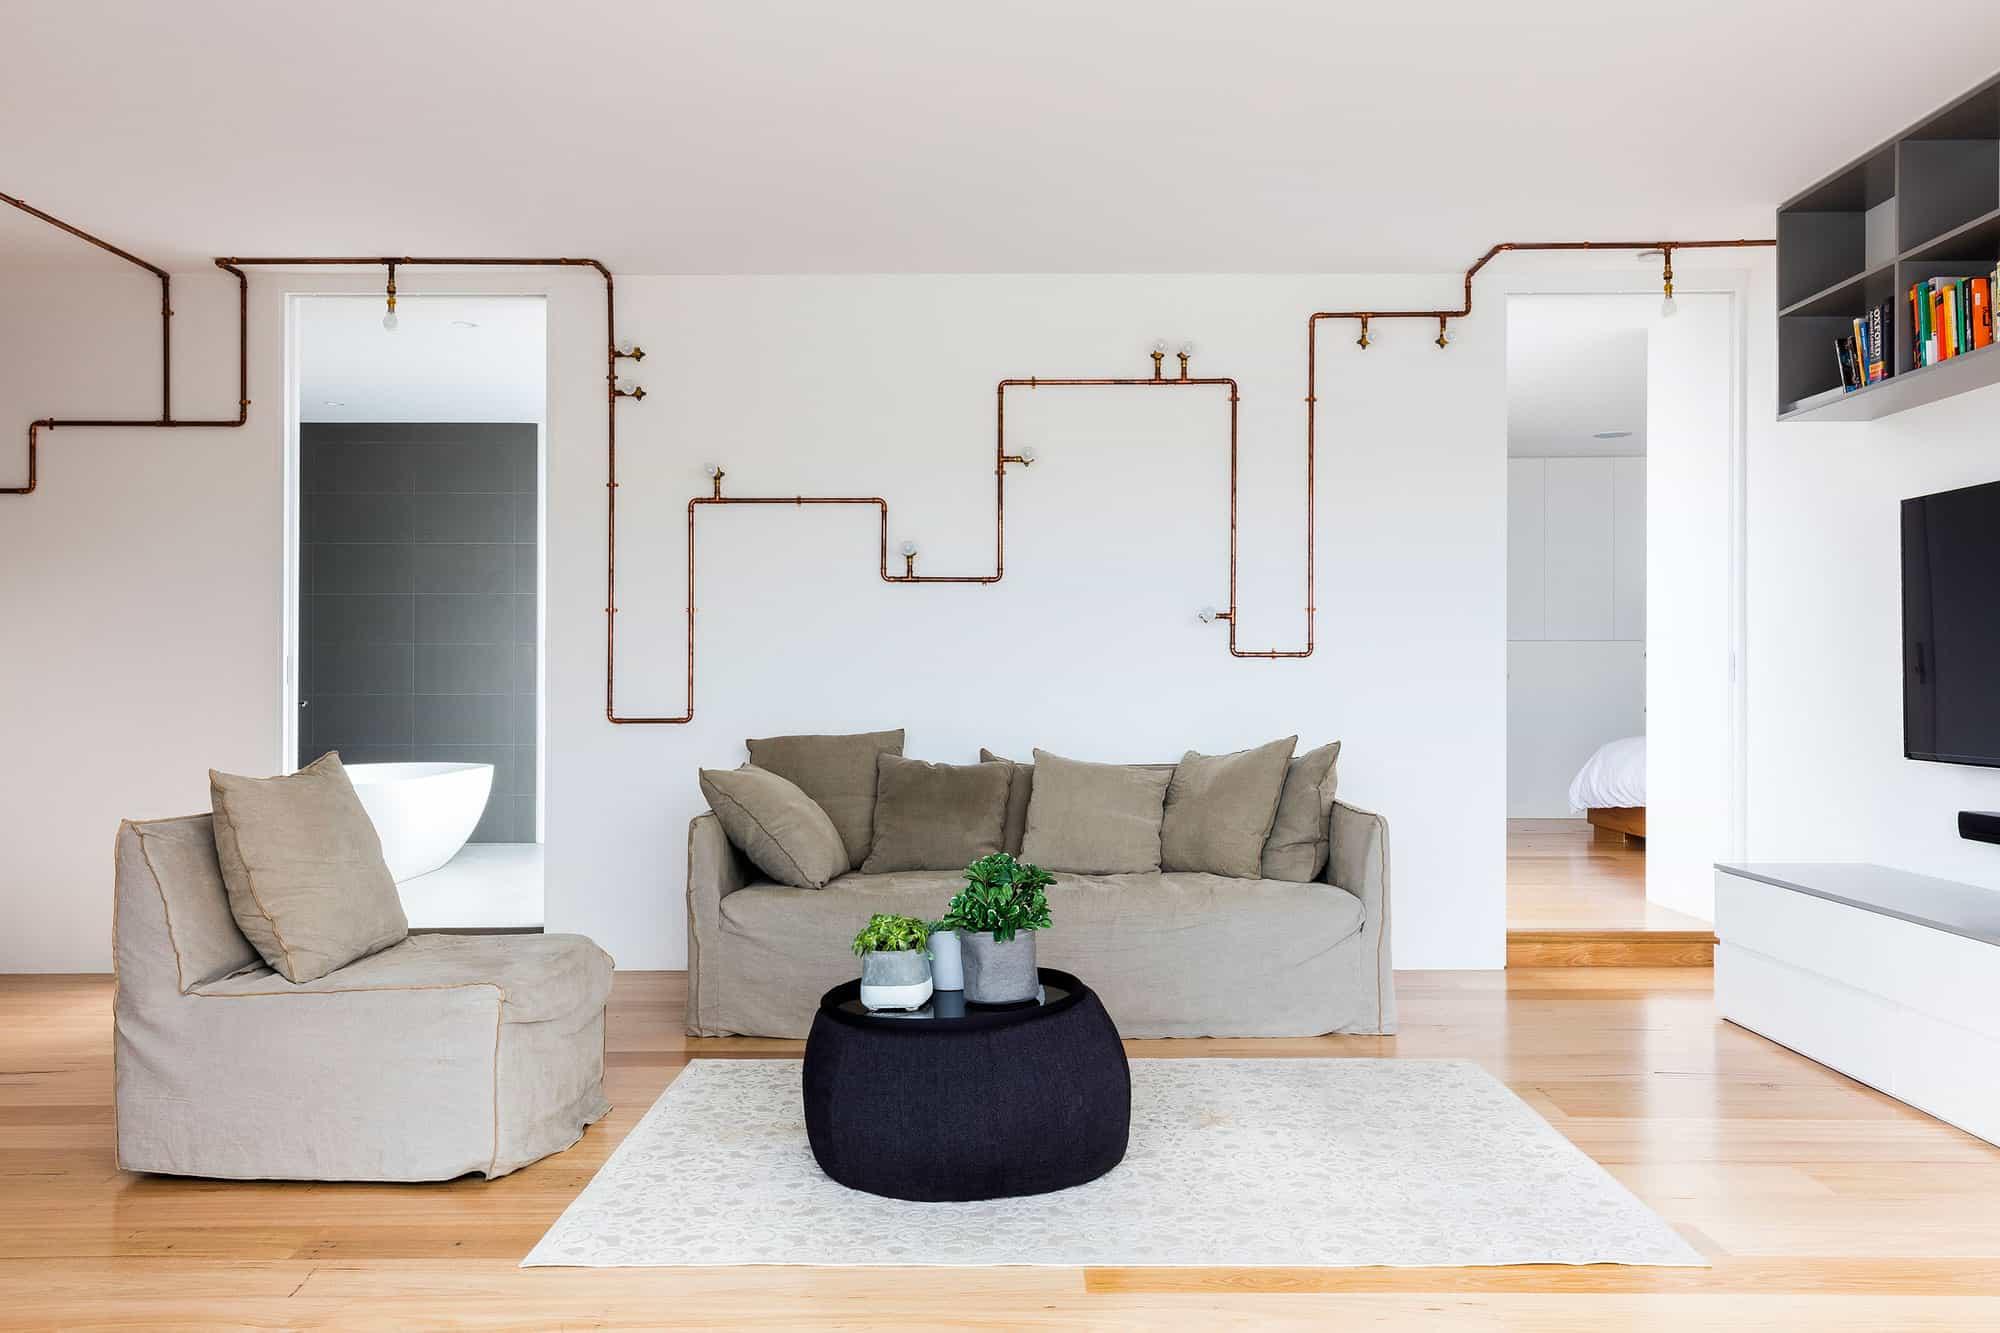 Josephine Hurley Architecture Designs a Contemporary Apartment in Surry Hills, Australia